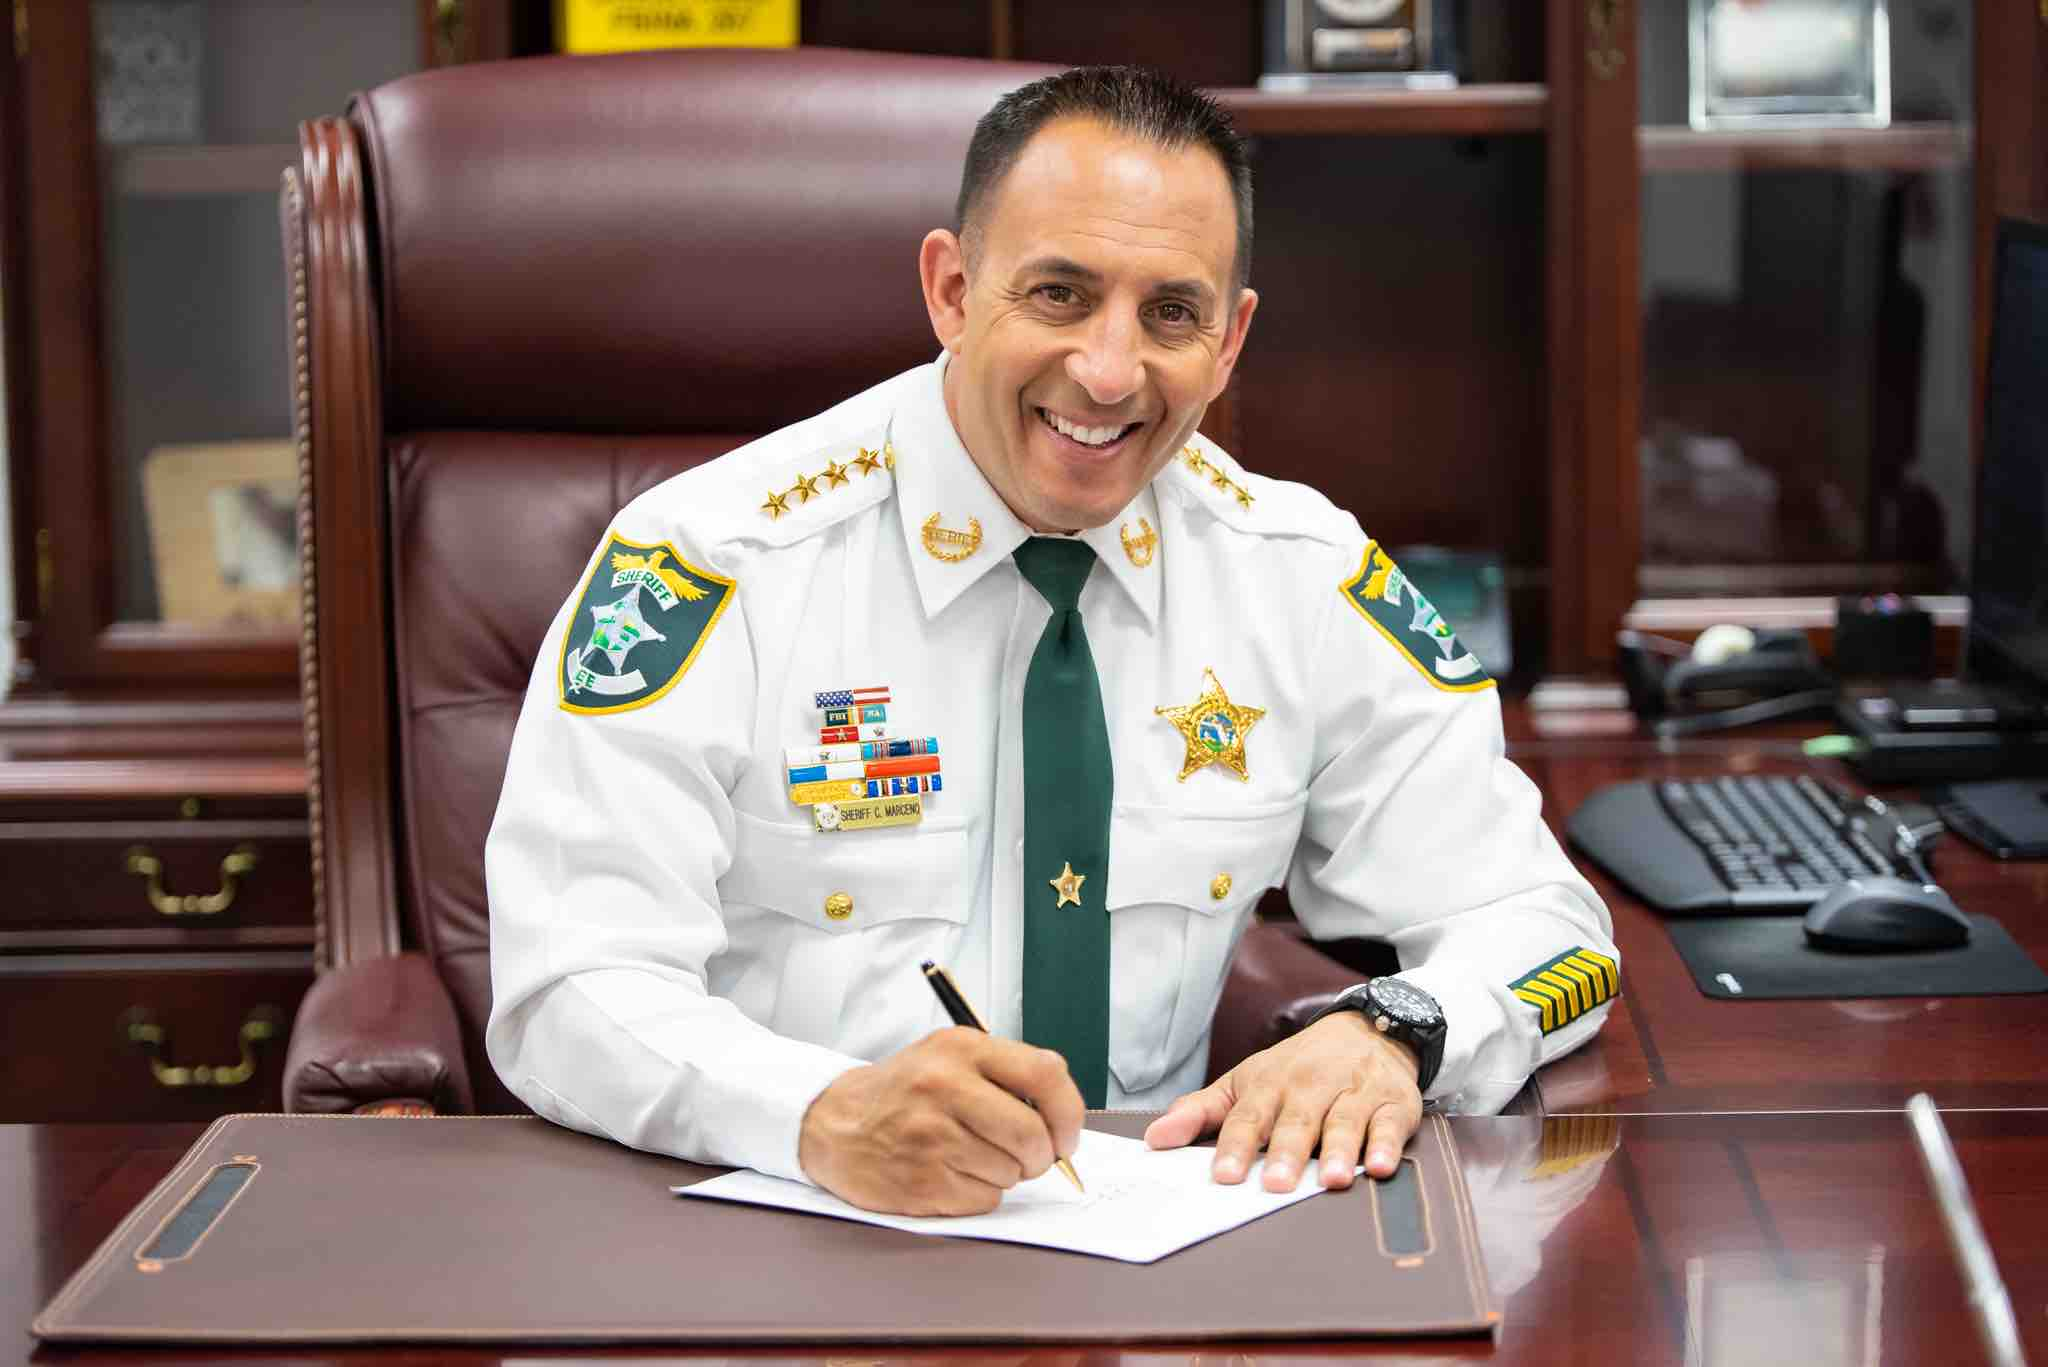 Lee County Sheriff Carmine Marceno